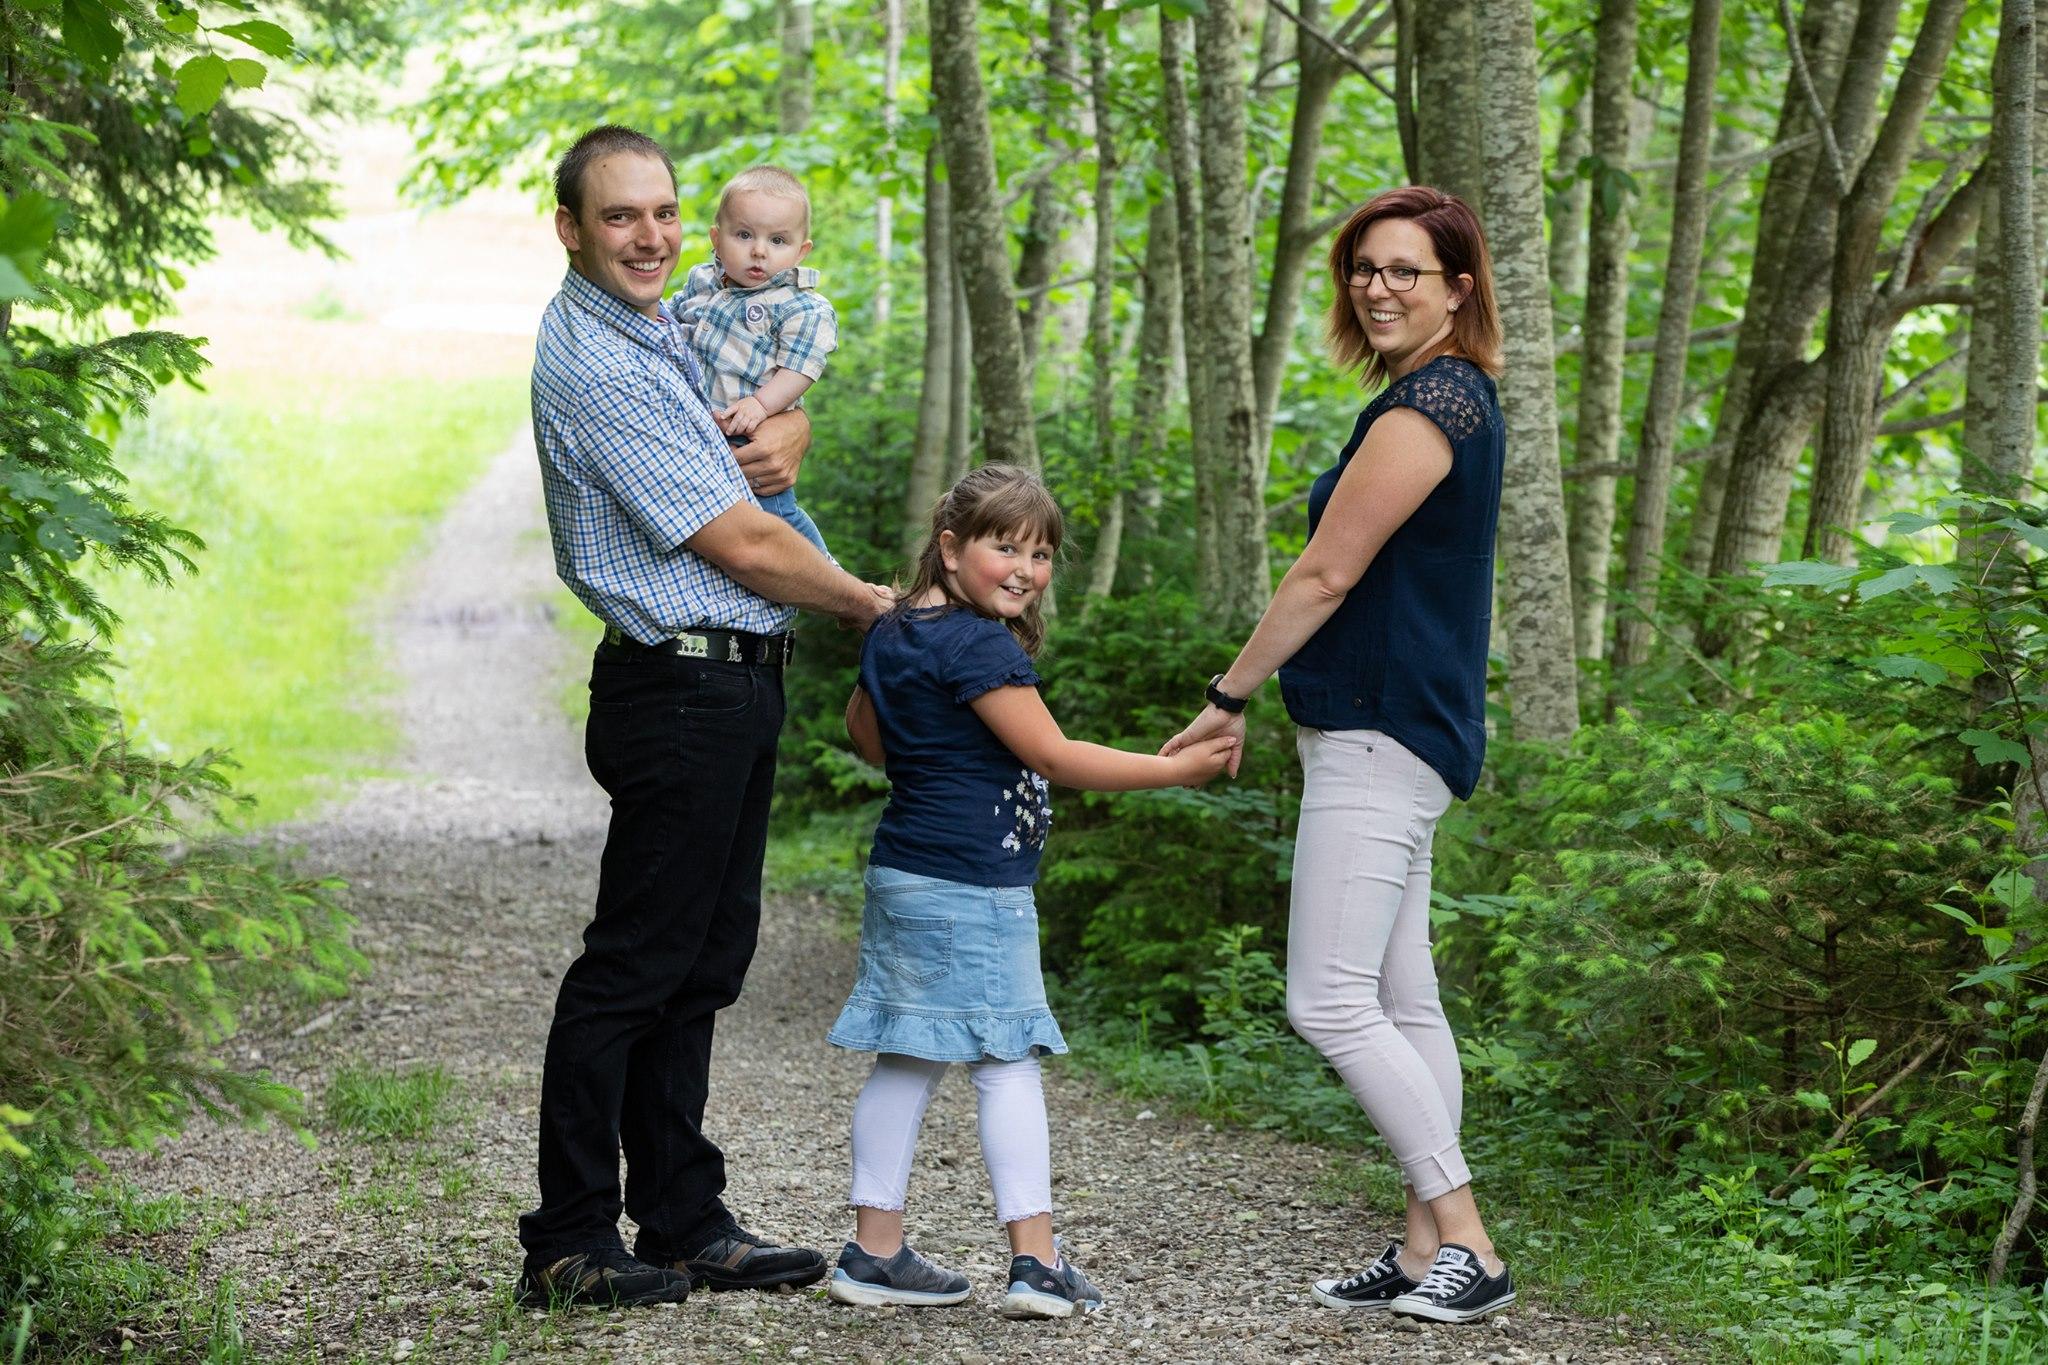 Familienshooting mit 2 Kinder im Wald